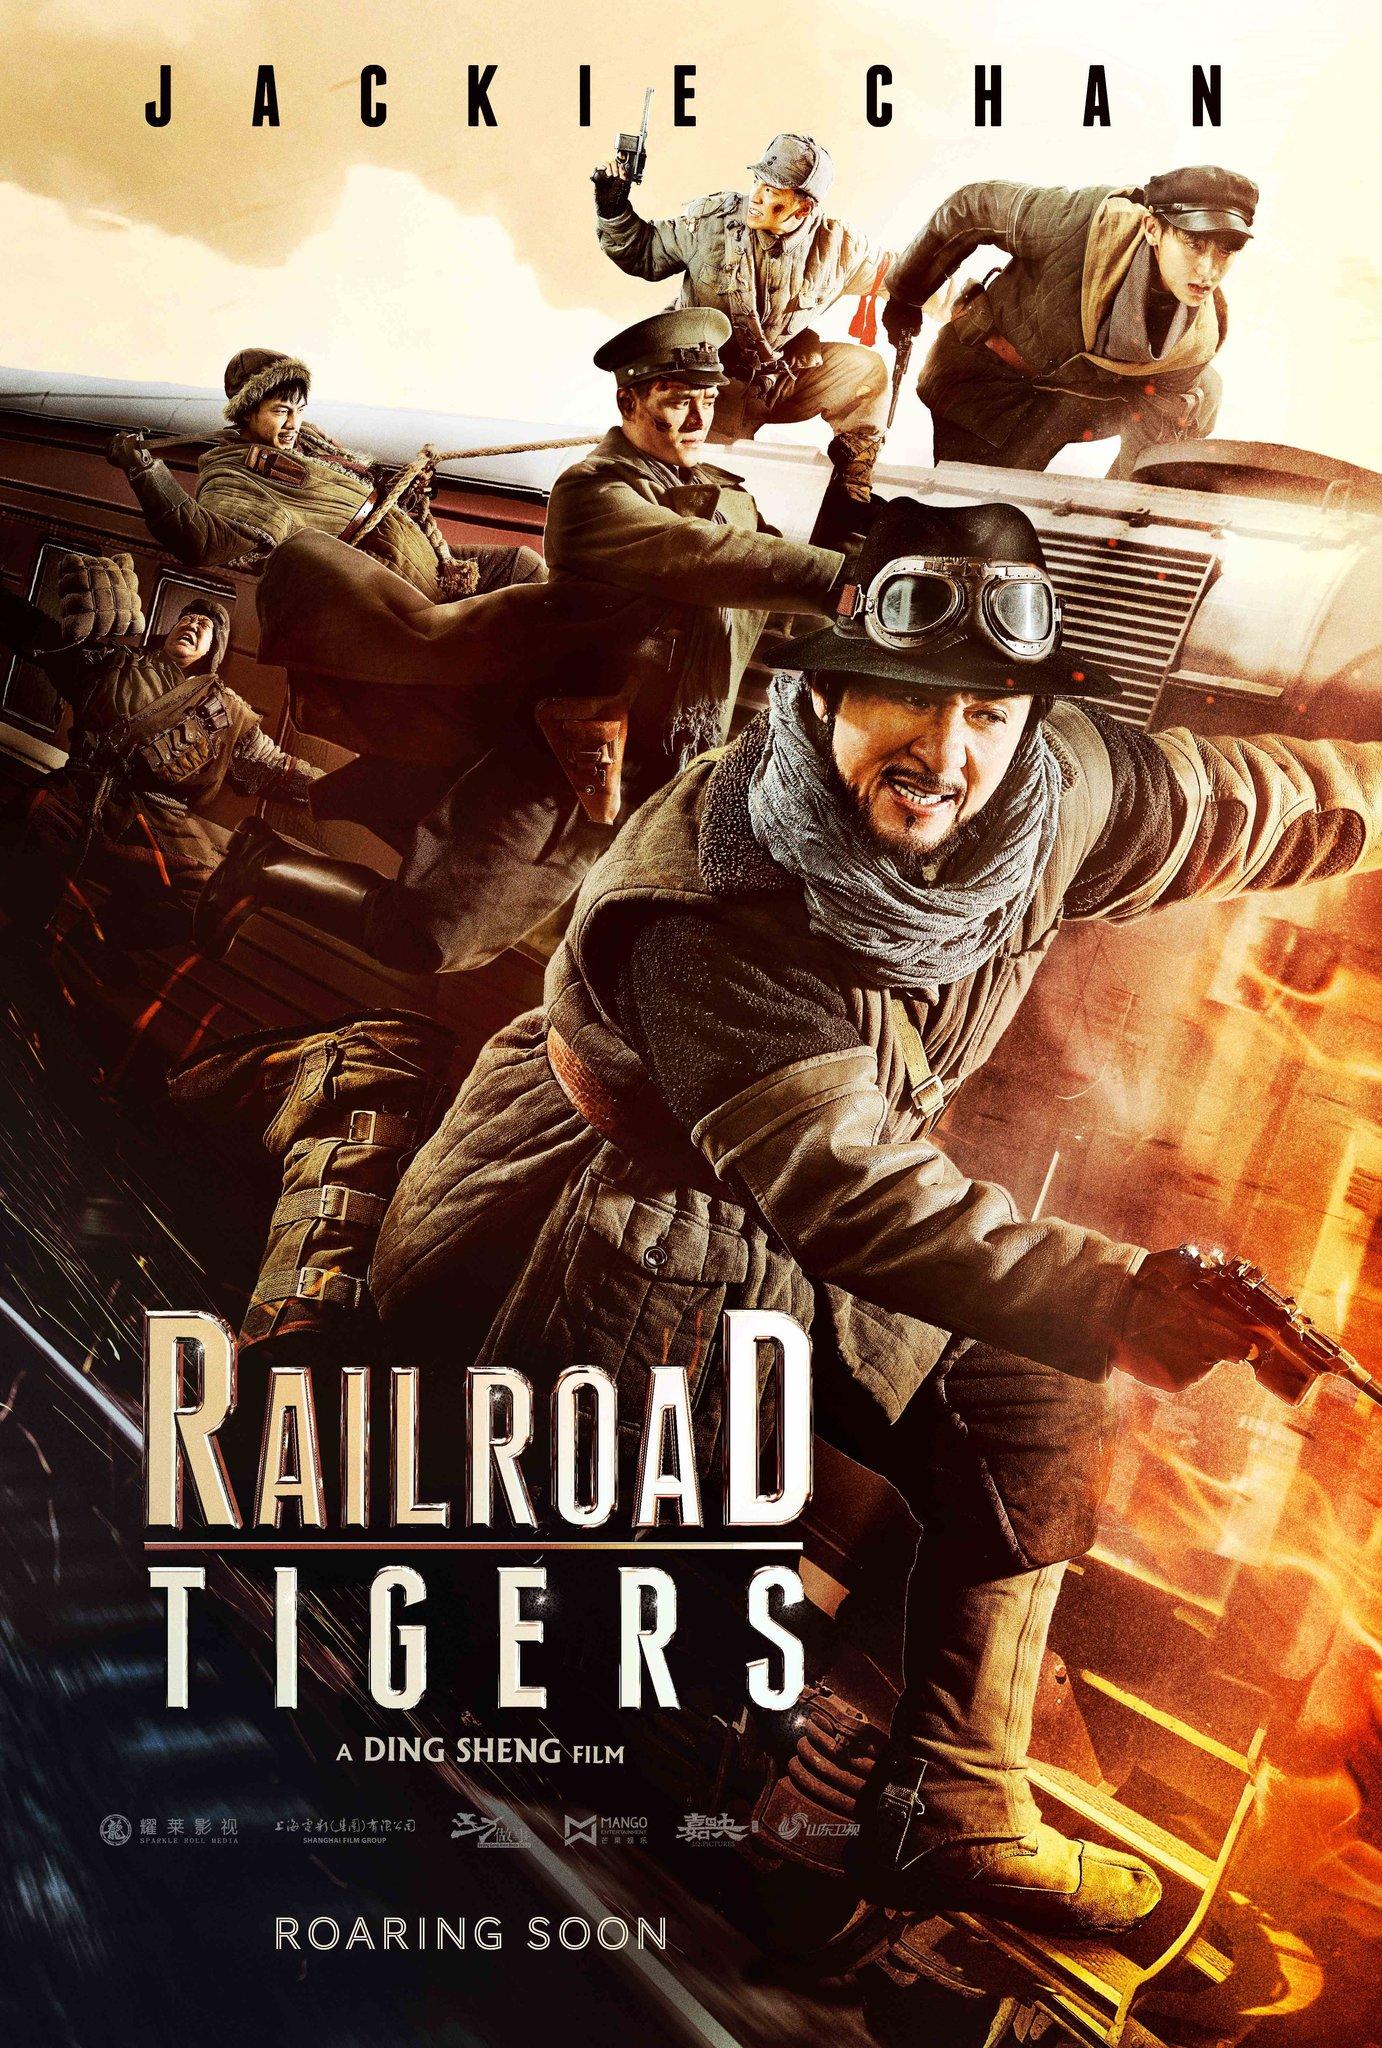 Railroad Tigers (2016) Dual Audio Hindi | 1080p | 720p | 480p | Bluray ESubs Download